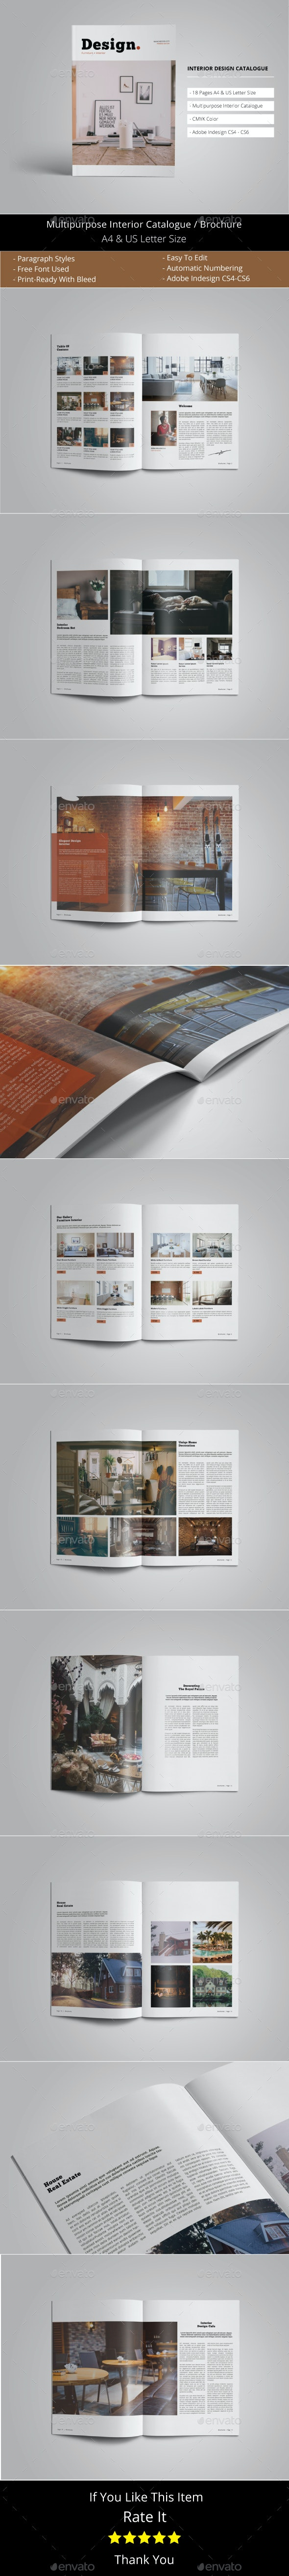 Interior Design Catalogue Template - Catalogs Brochures